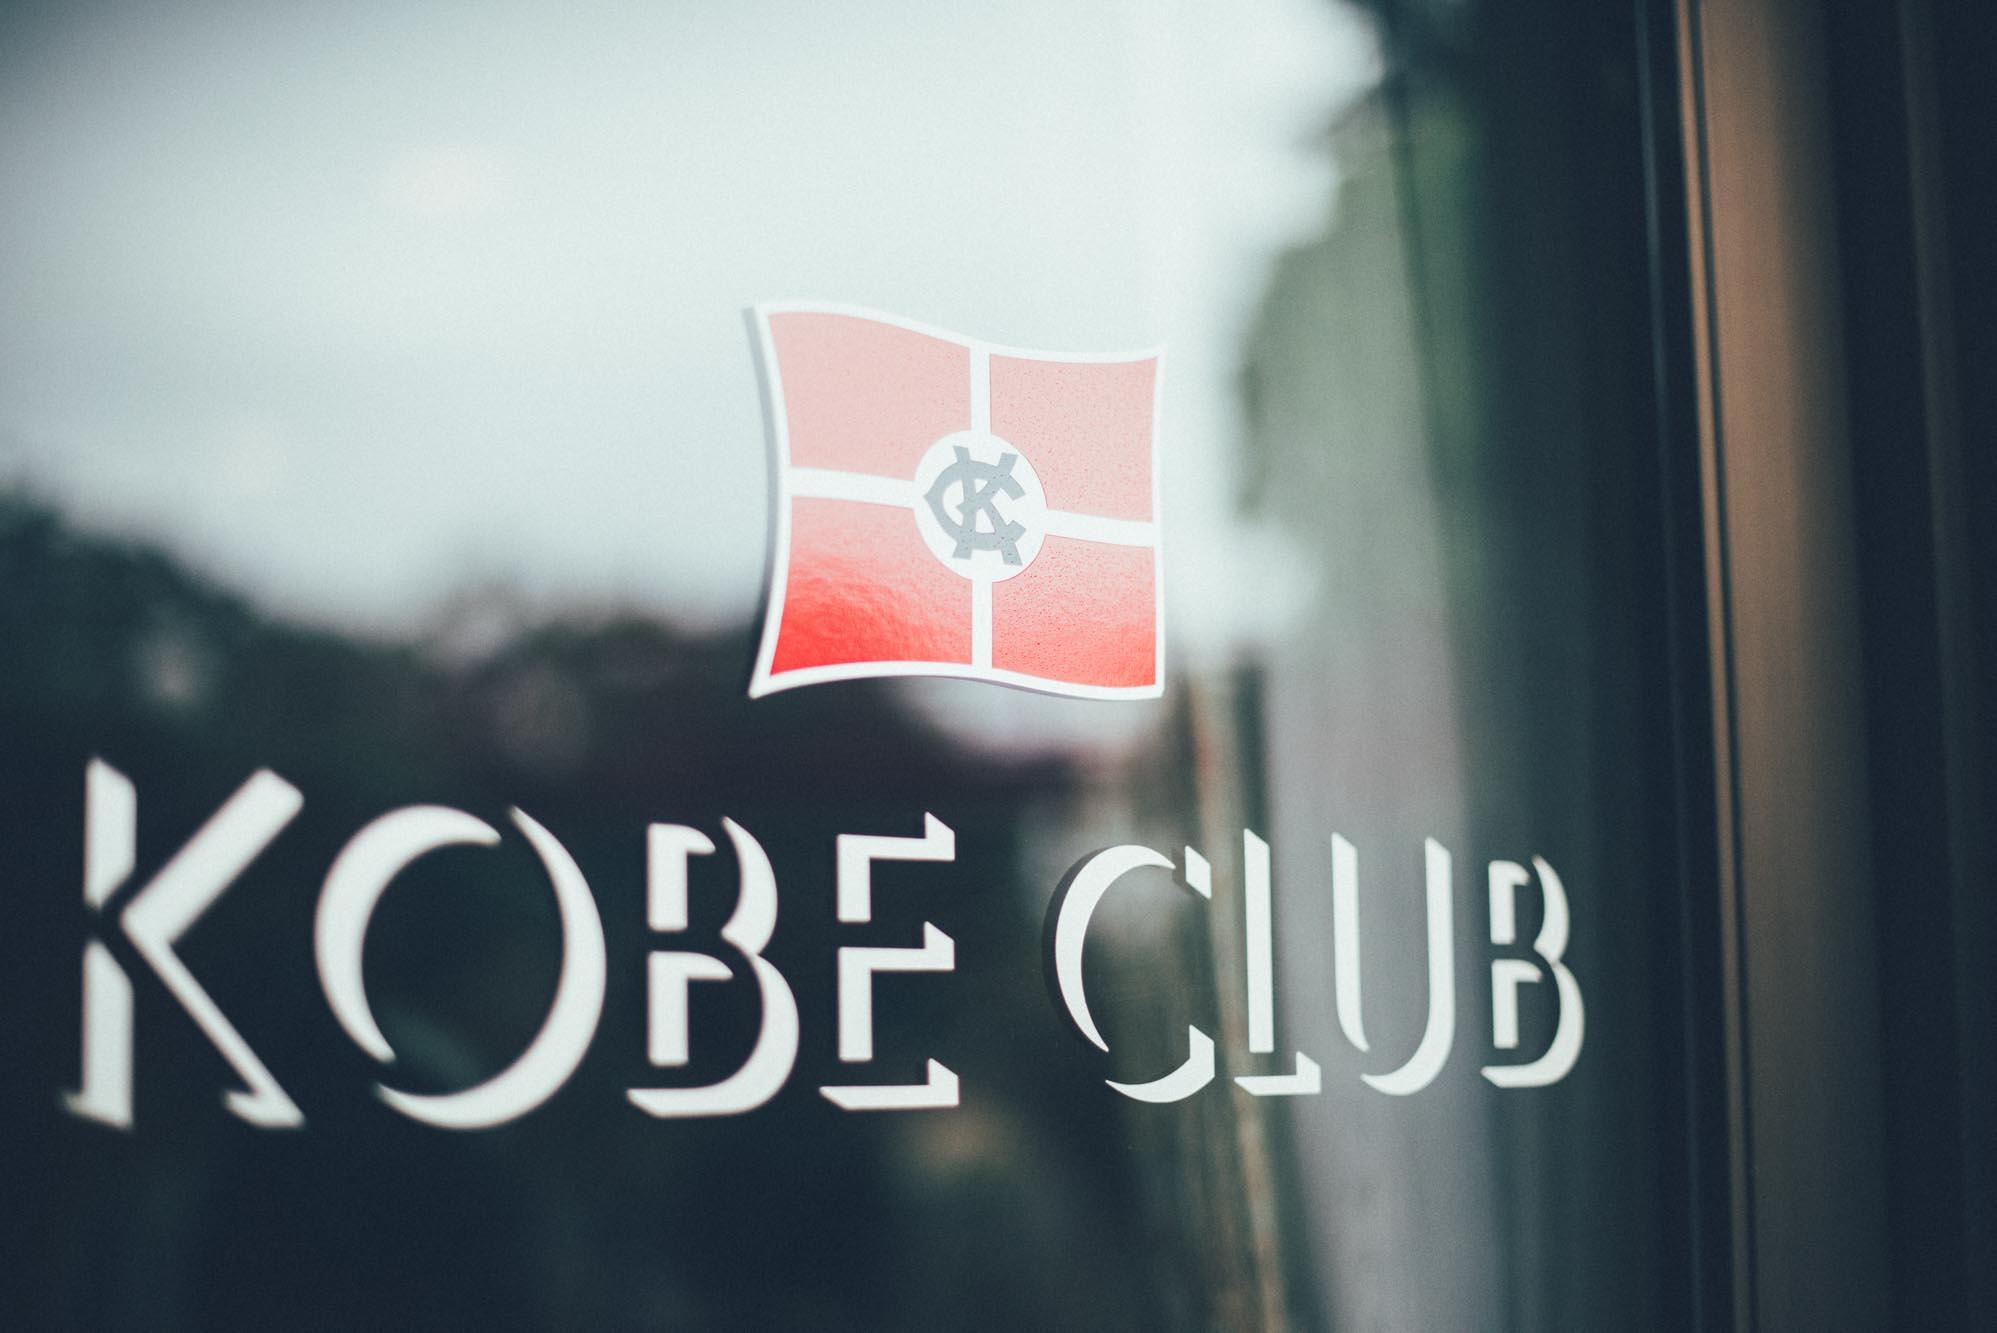 kobe club27_01